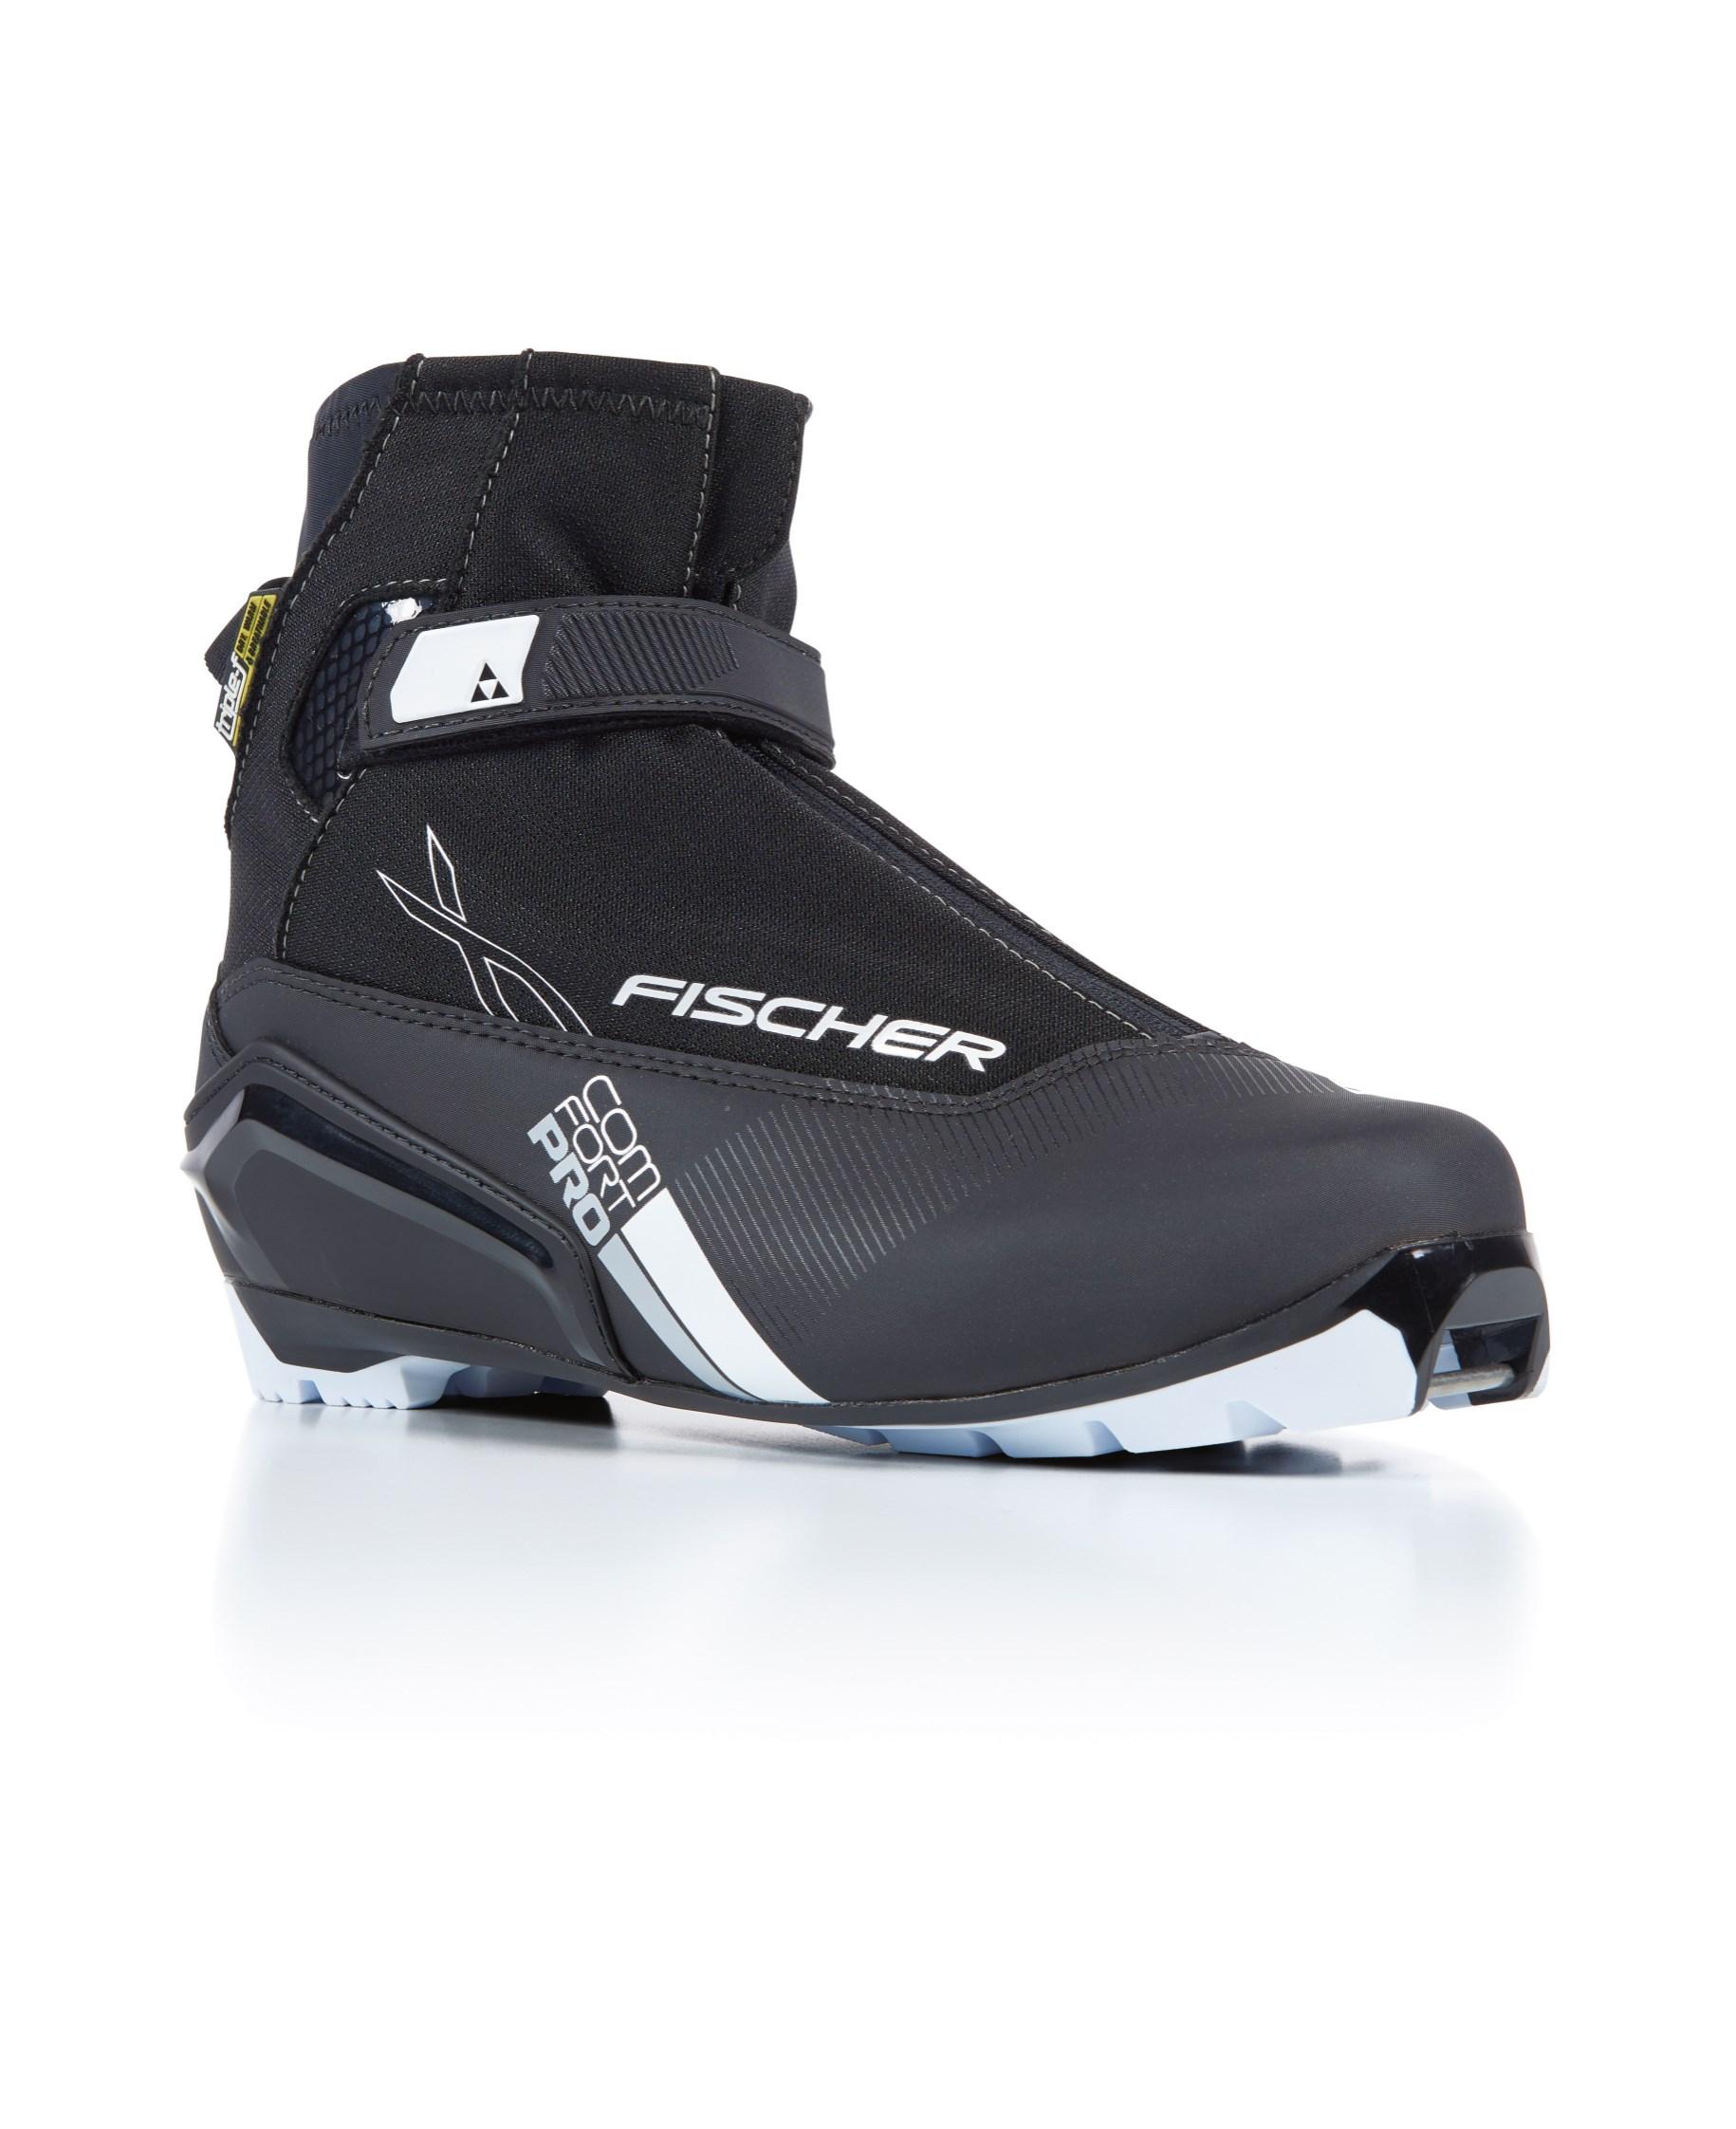 Fischer Langlaufschuh XC Comfort Pro black silver